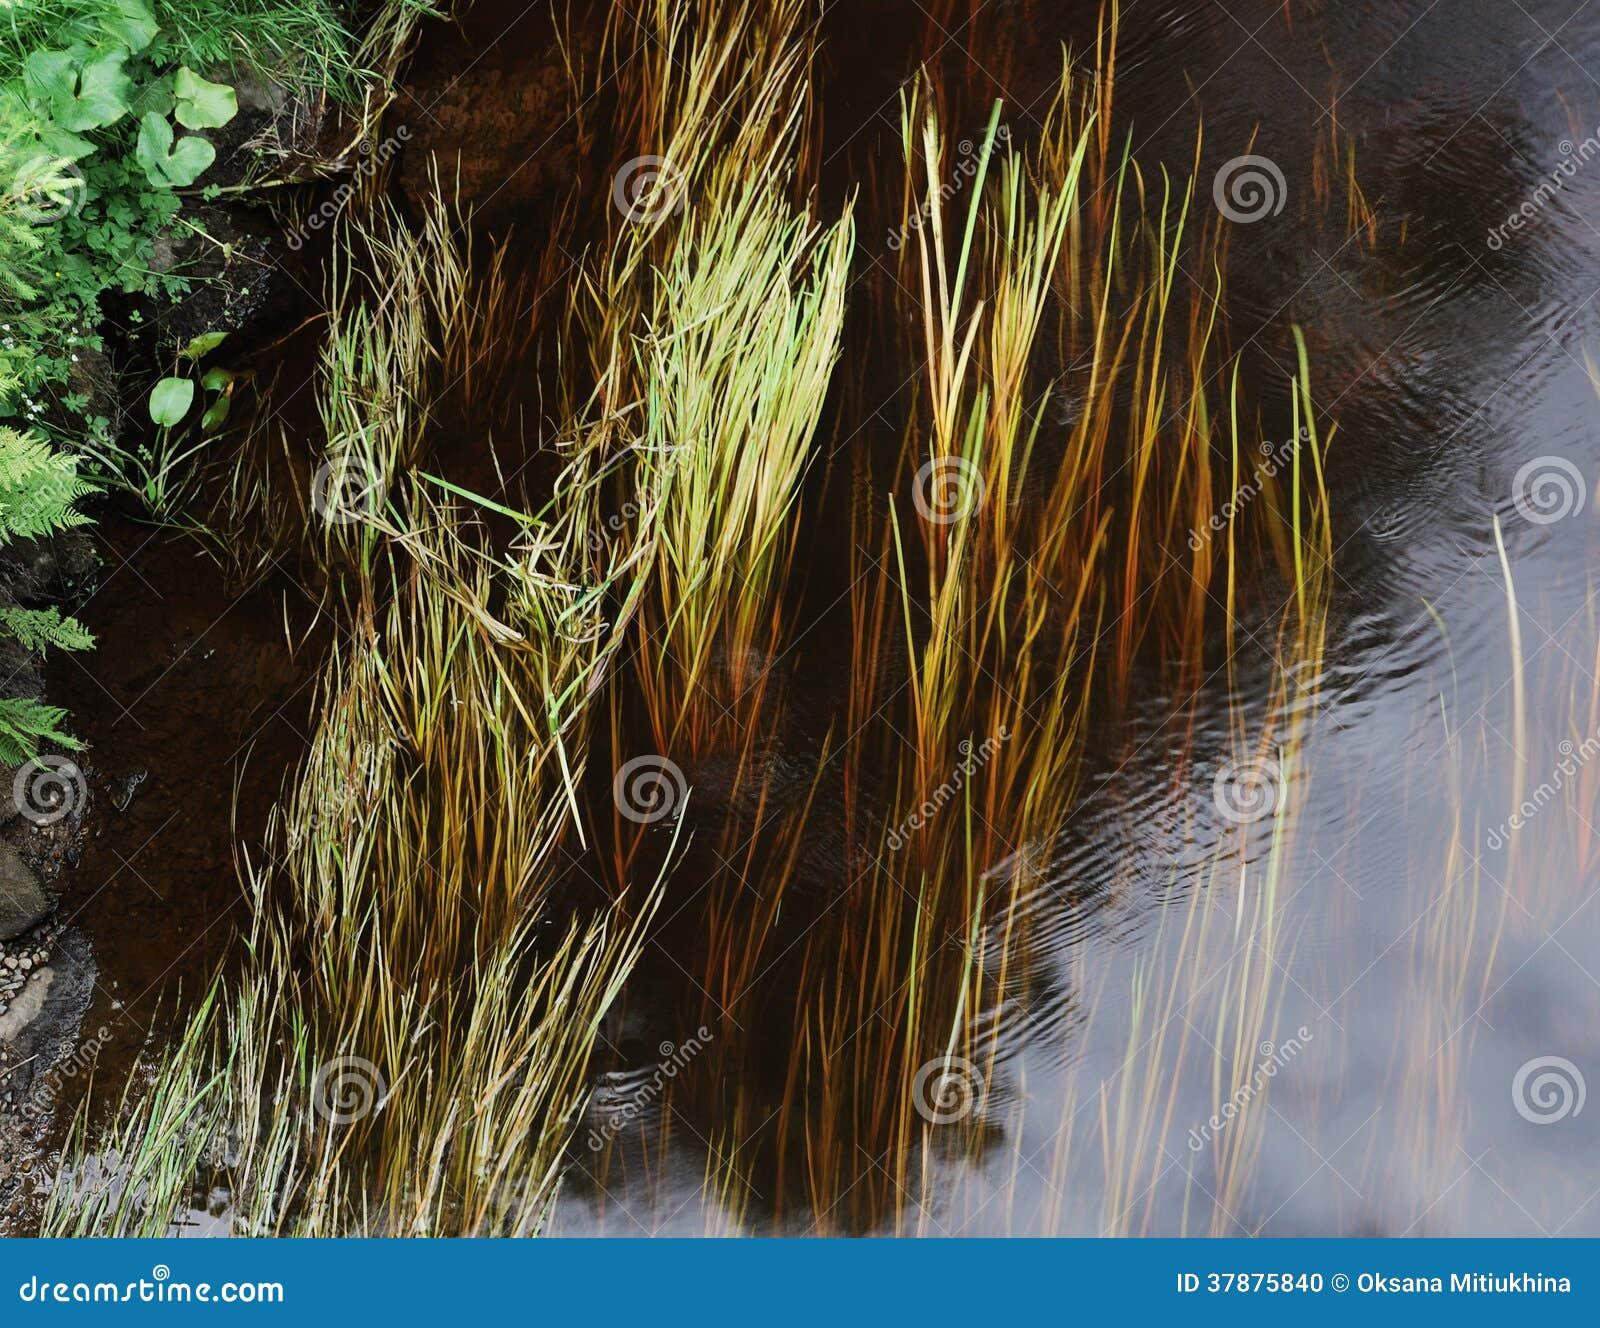 Driftweed attraverso acqua corrente